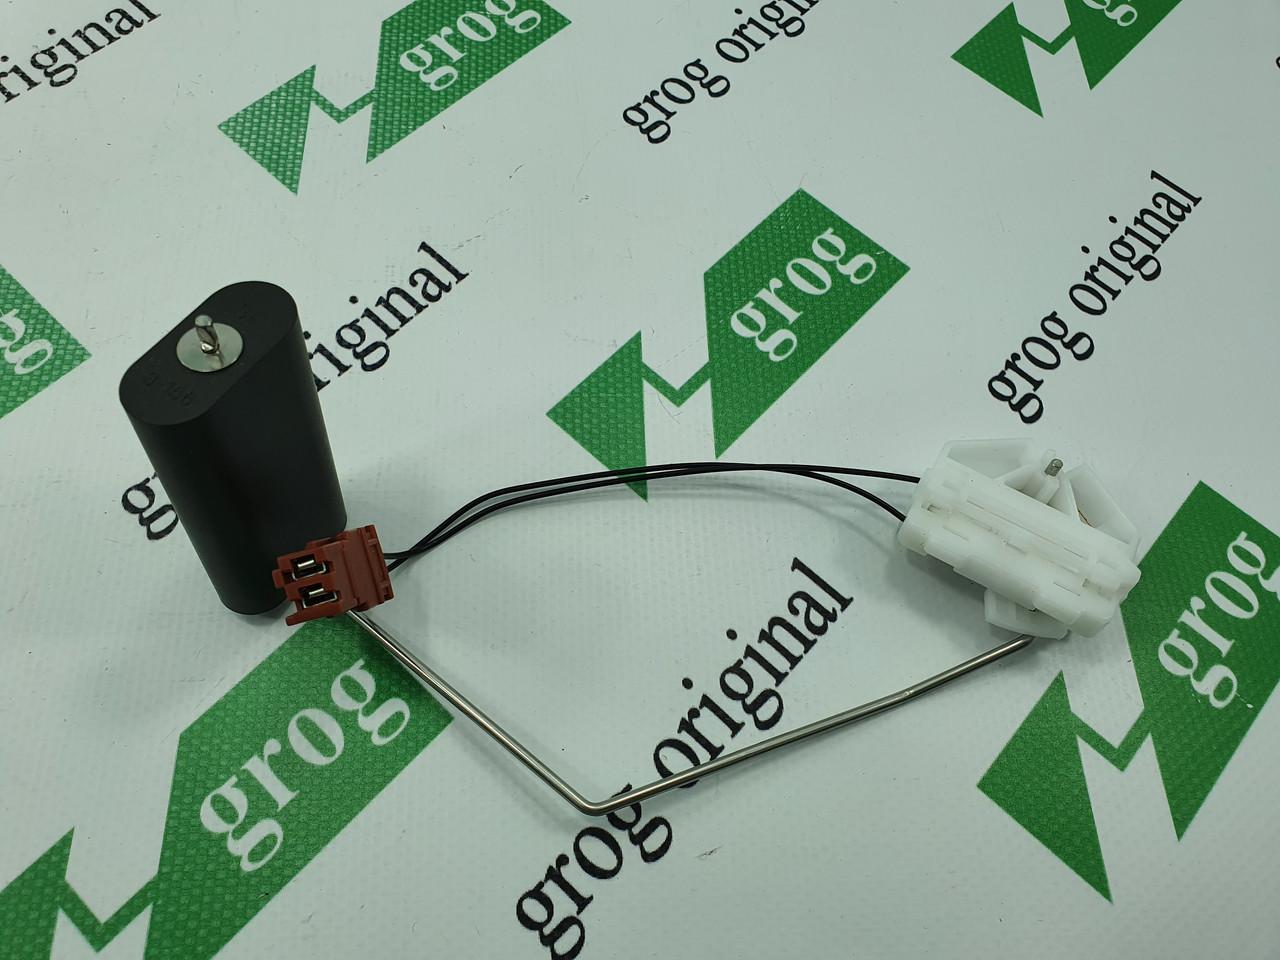 Фільтр в электробензонасосе РЕНО grog Корея